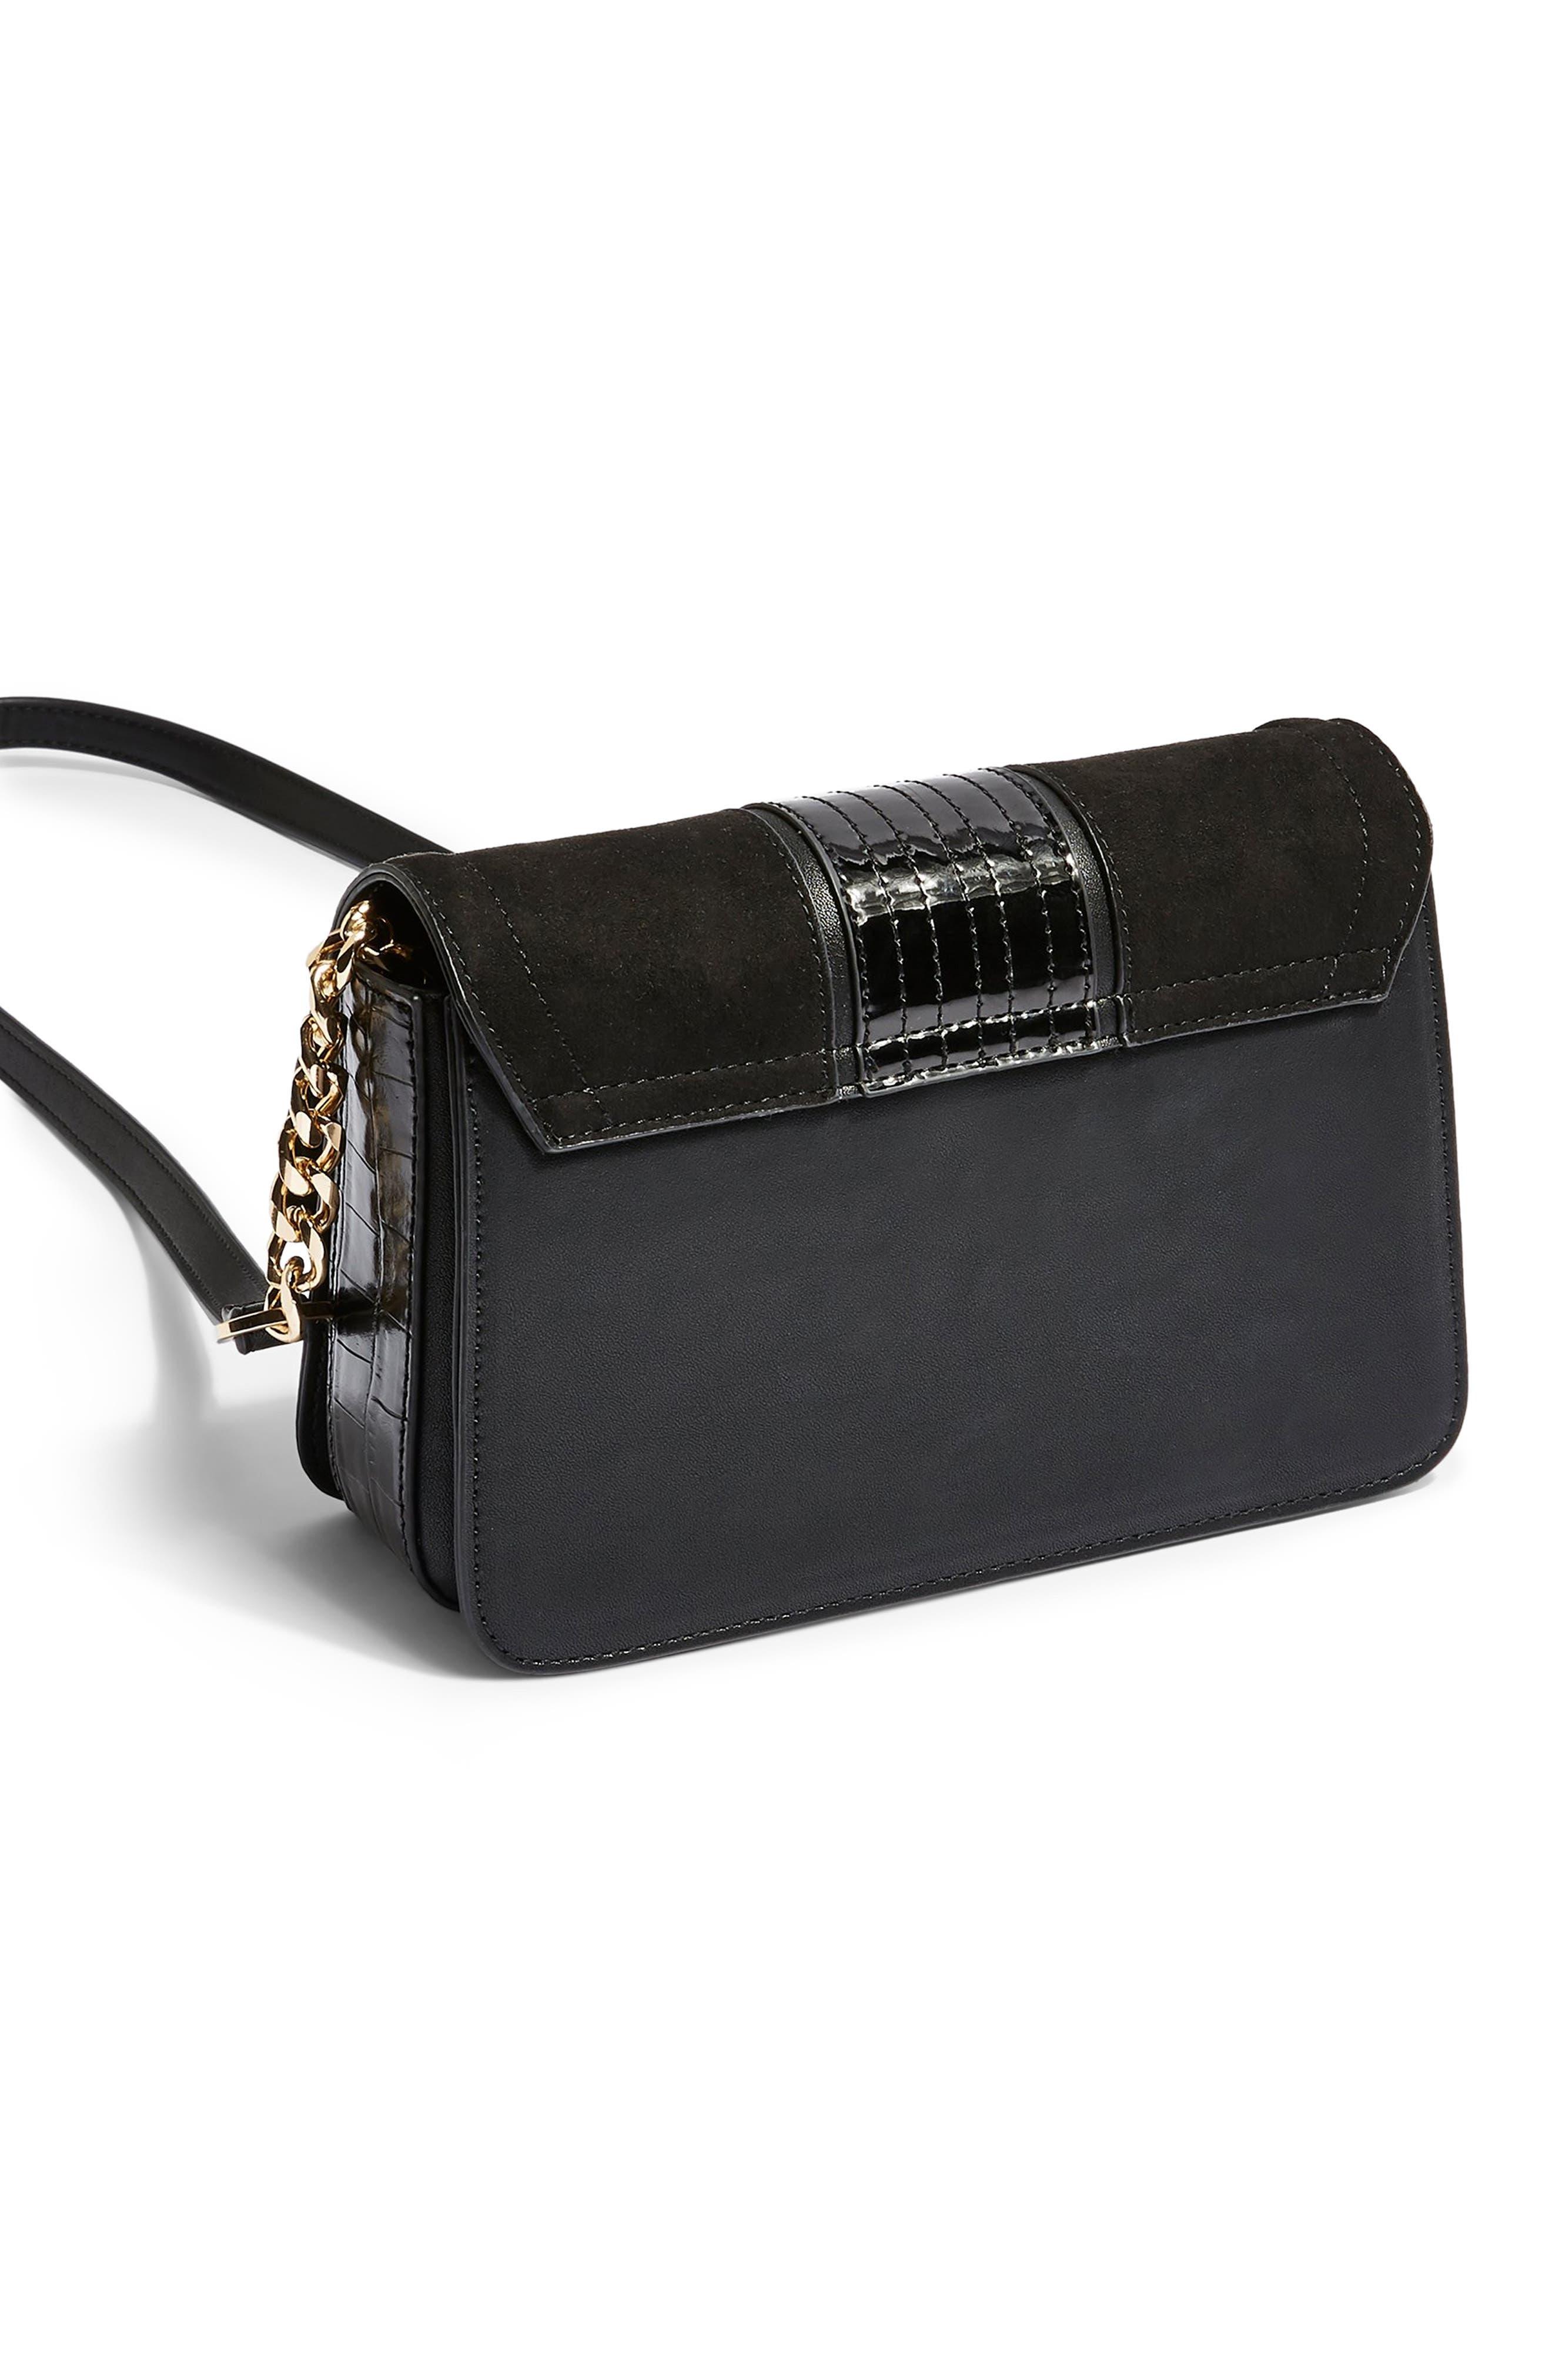 TOPSHOP, Cheetah Crossbody Bag, Alternate thumbnail 2, color, BLACK MULTI